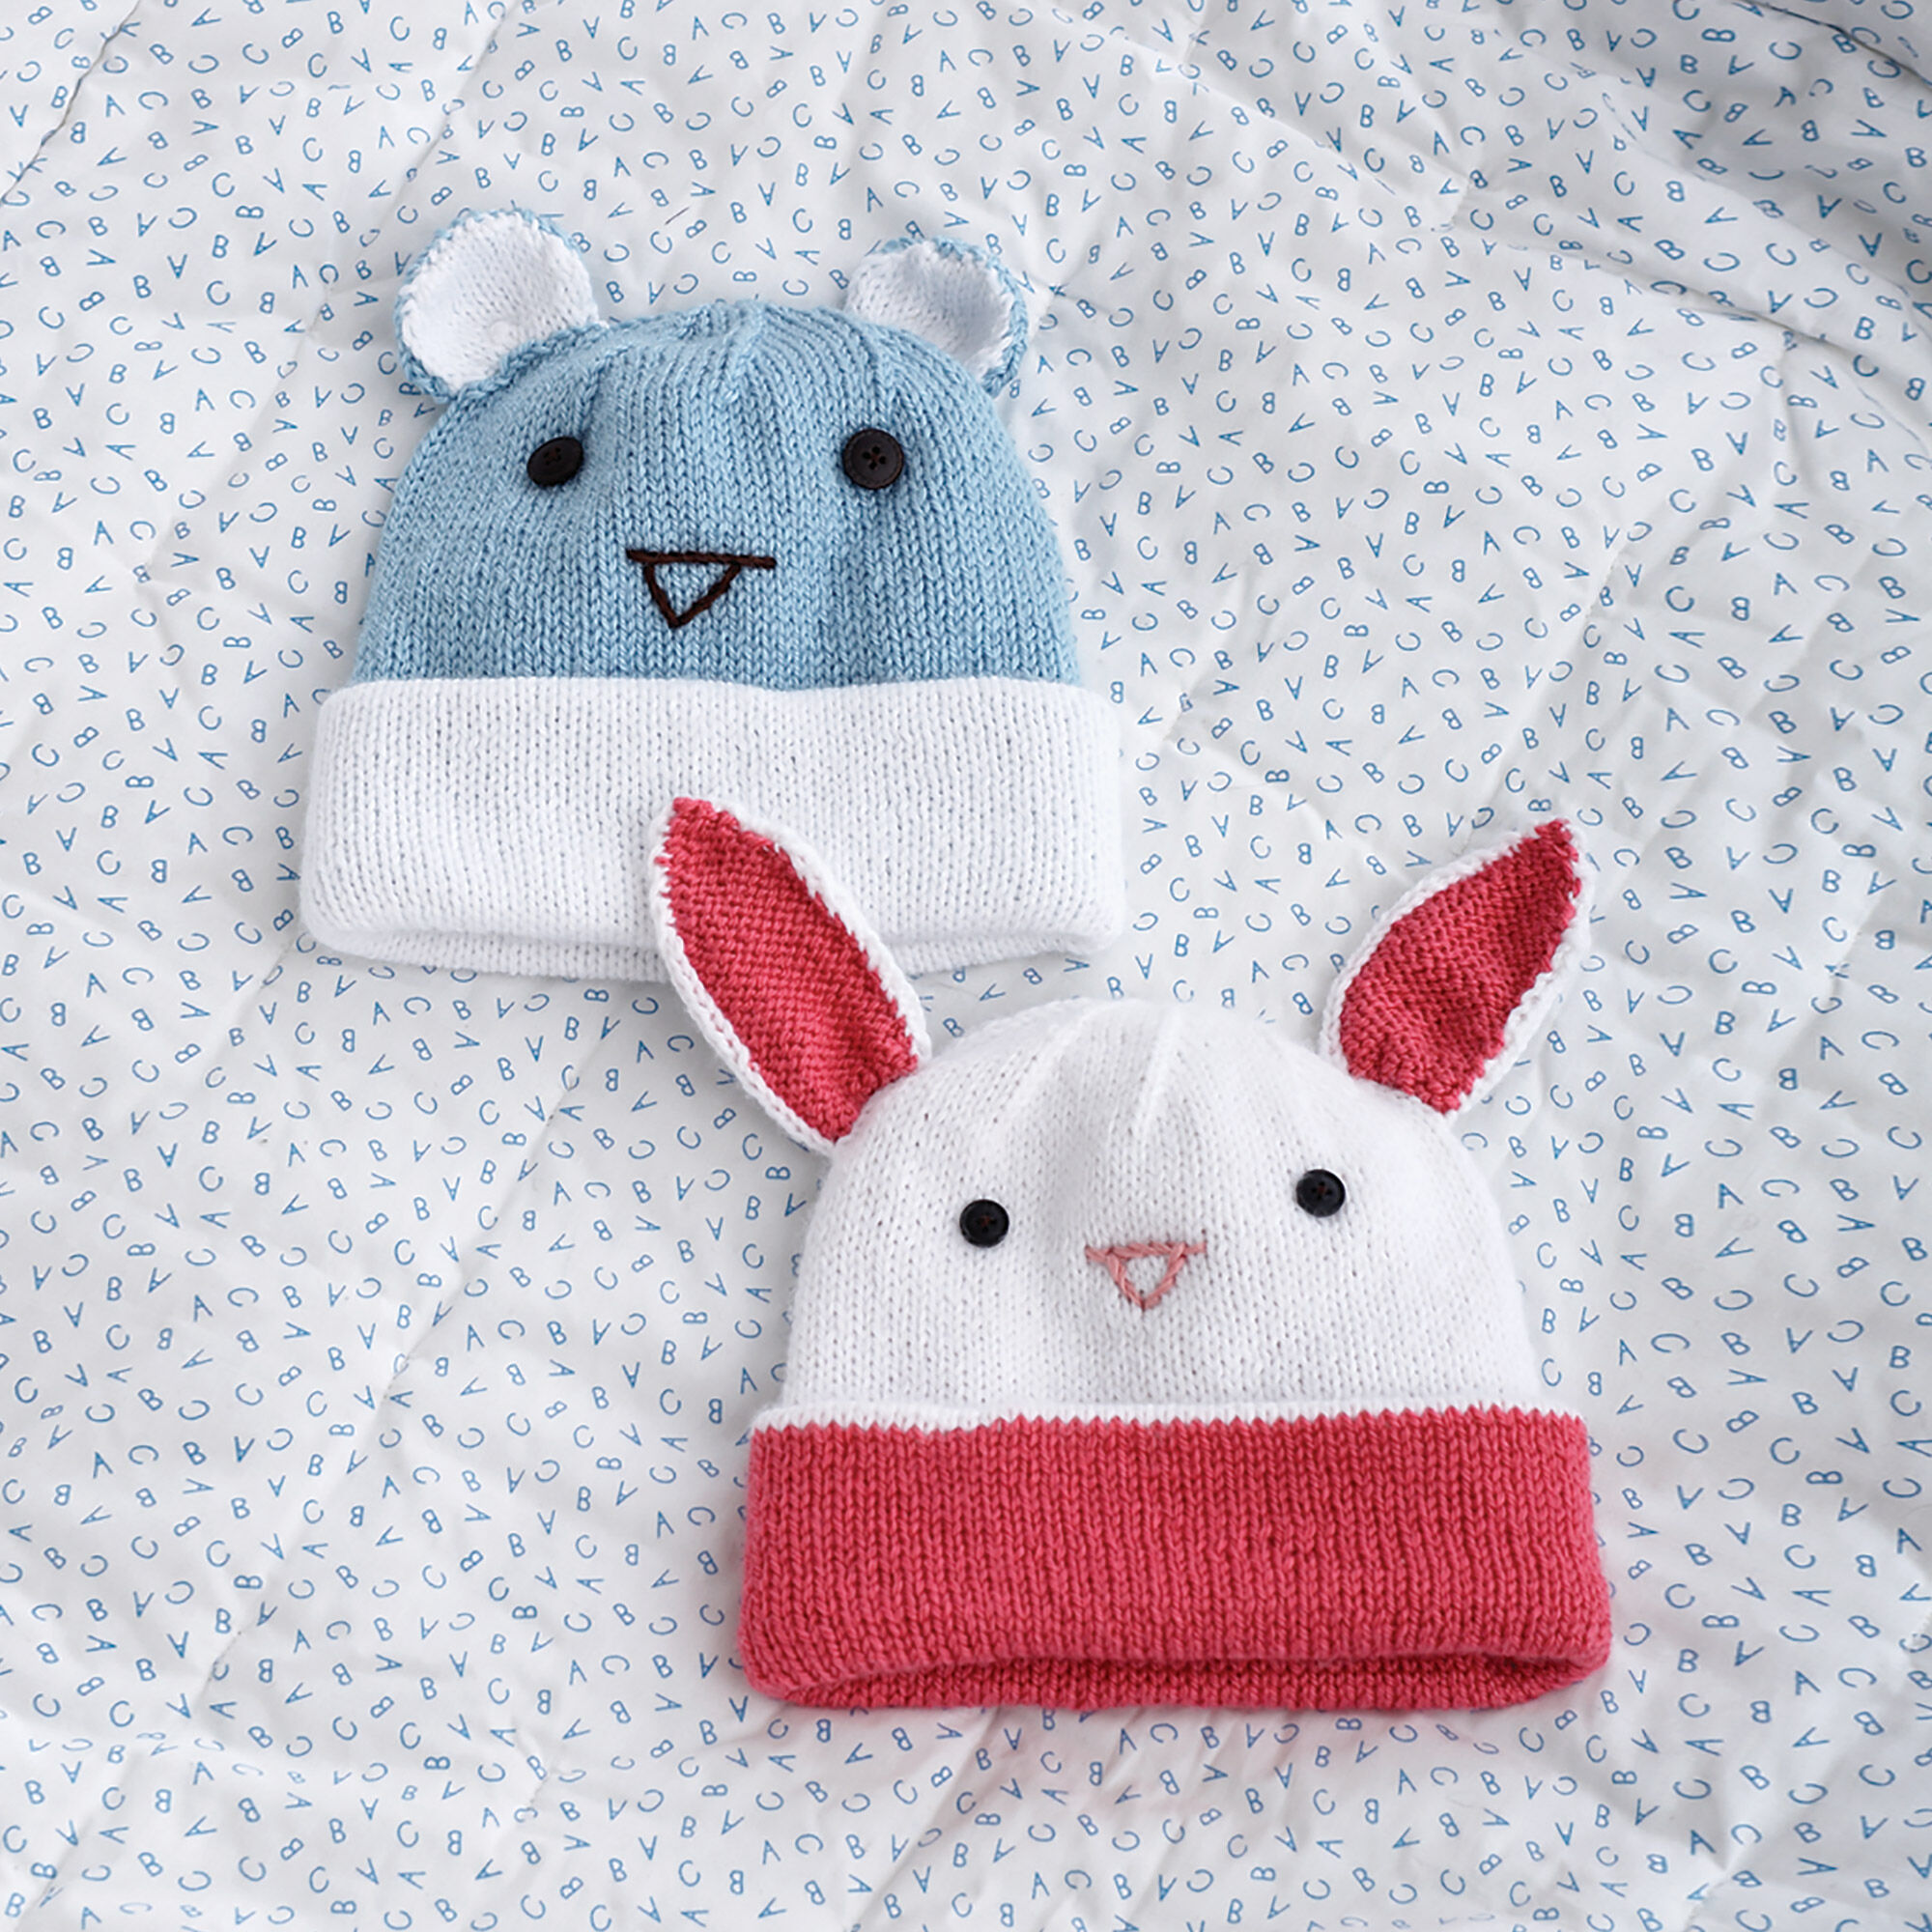 Bernat Knit Hats with Ears, Bunny | Yarnspirations